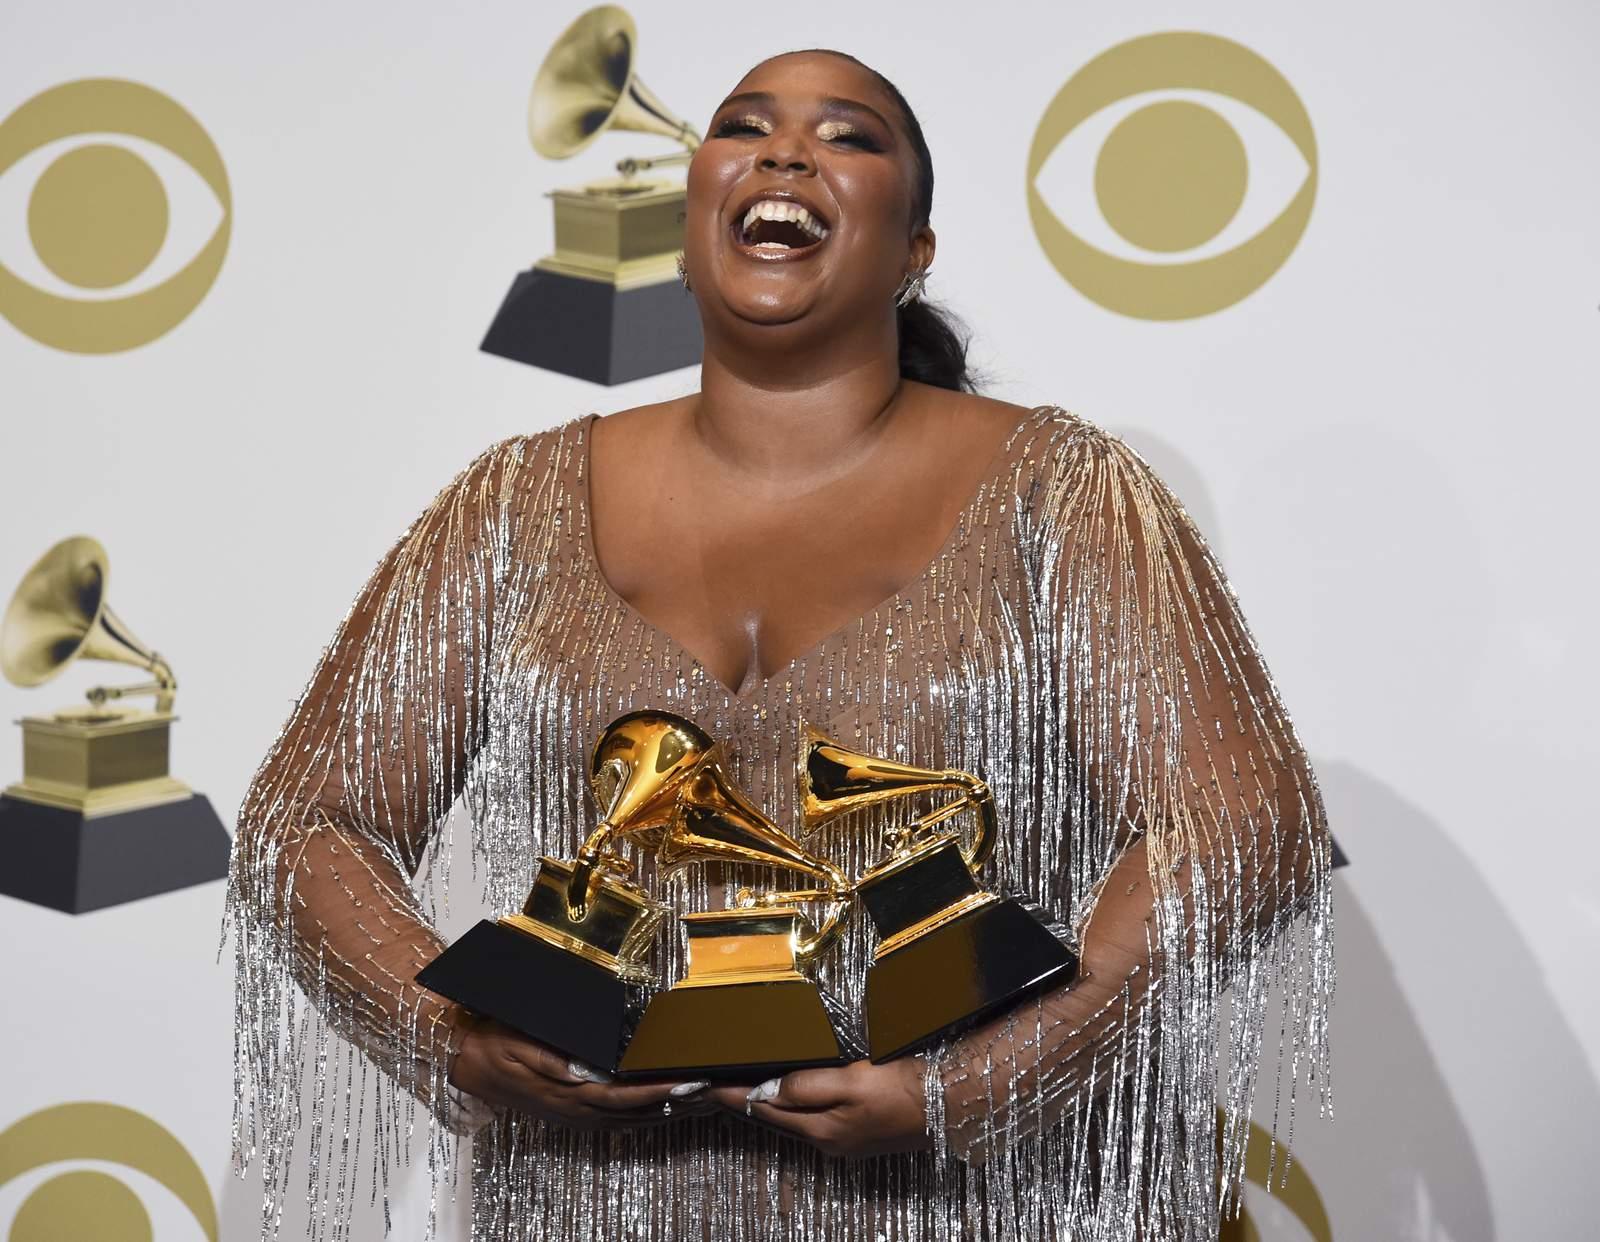 Lizzo won three Grammys, but her mind was on Kobe Bryant tragedy